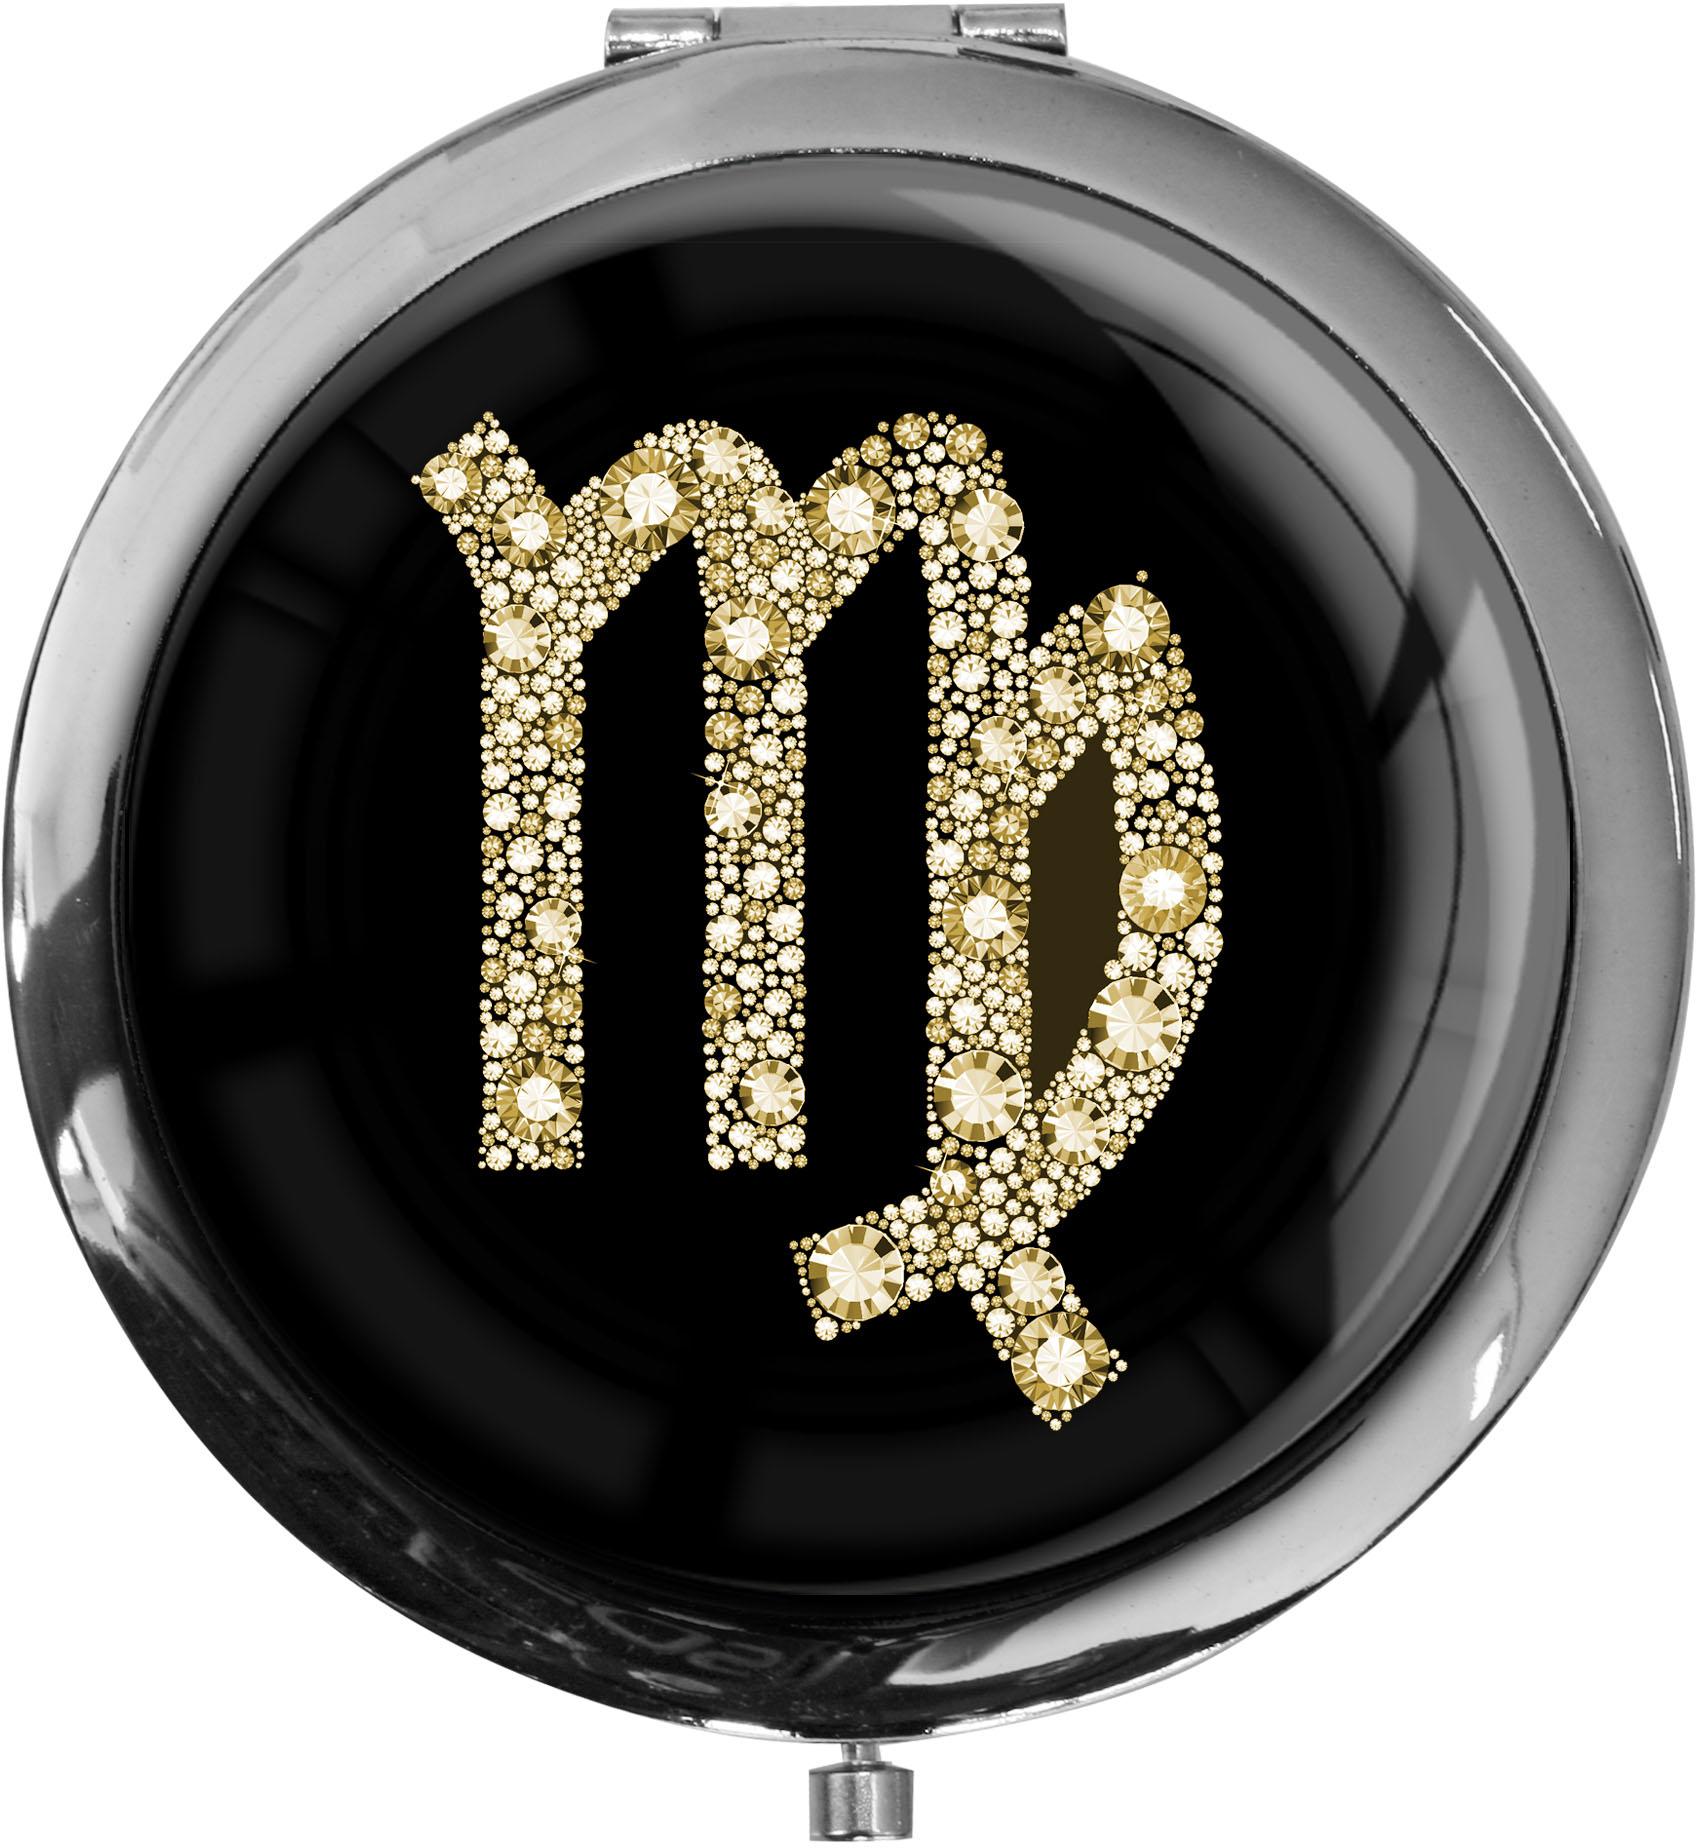 "metALUm - Extragroße Pillendose in runder Form ""Sternzeichen Jungfrau in Gold"""